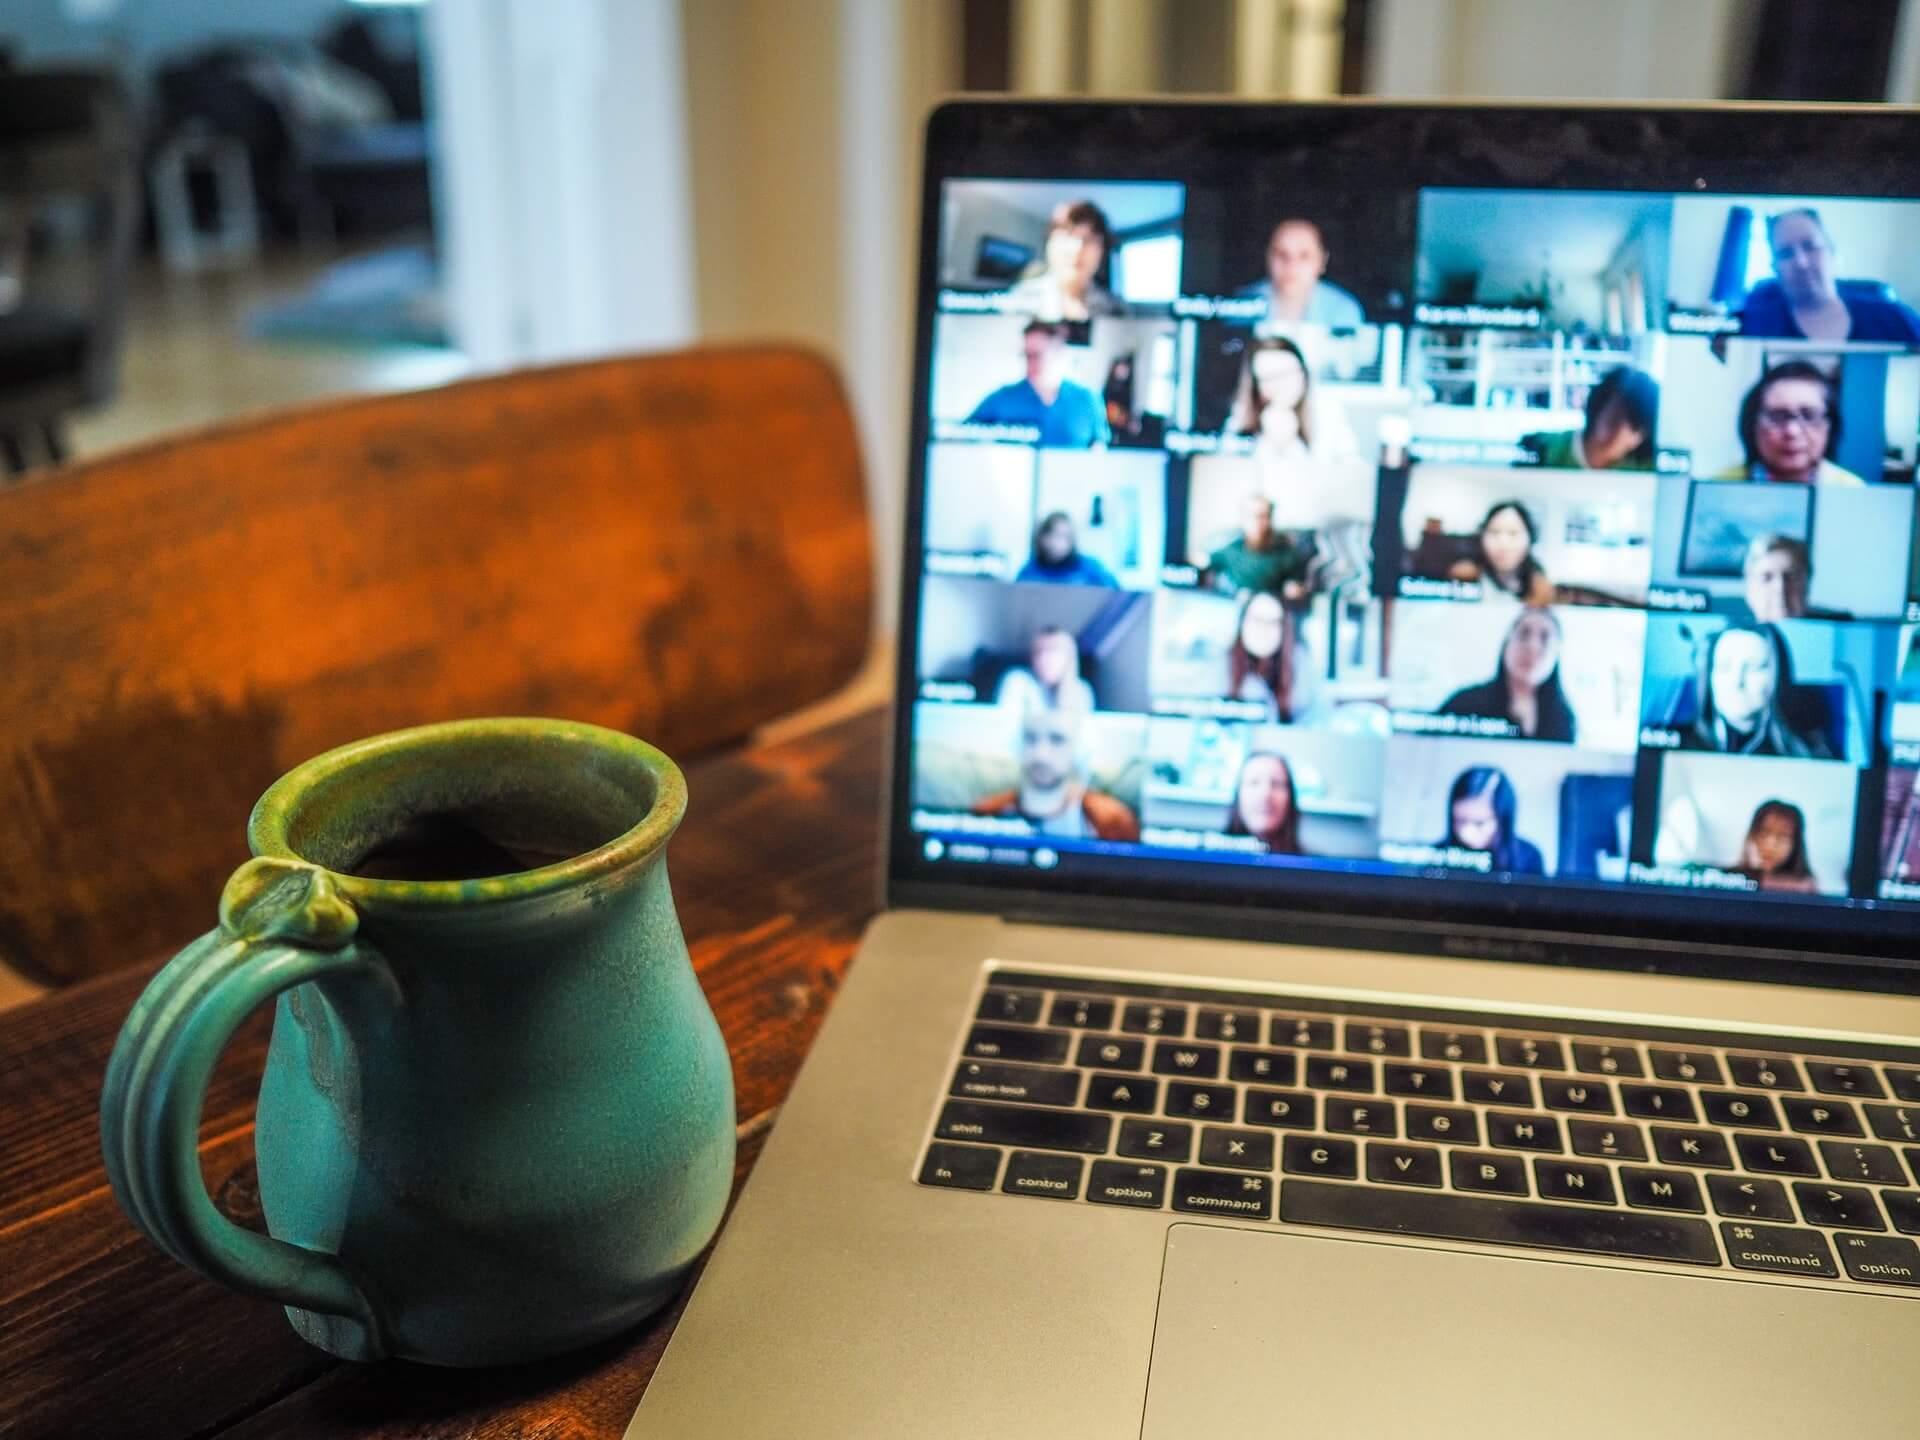 mug of coffee and zoom on laptop